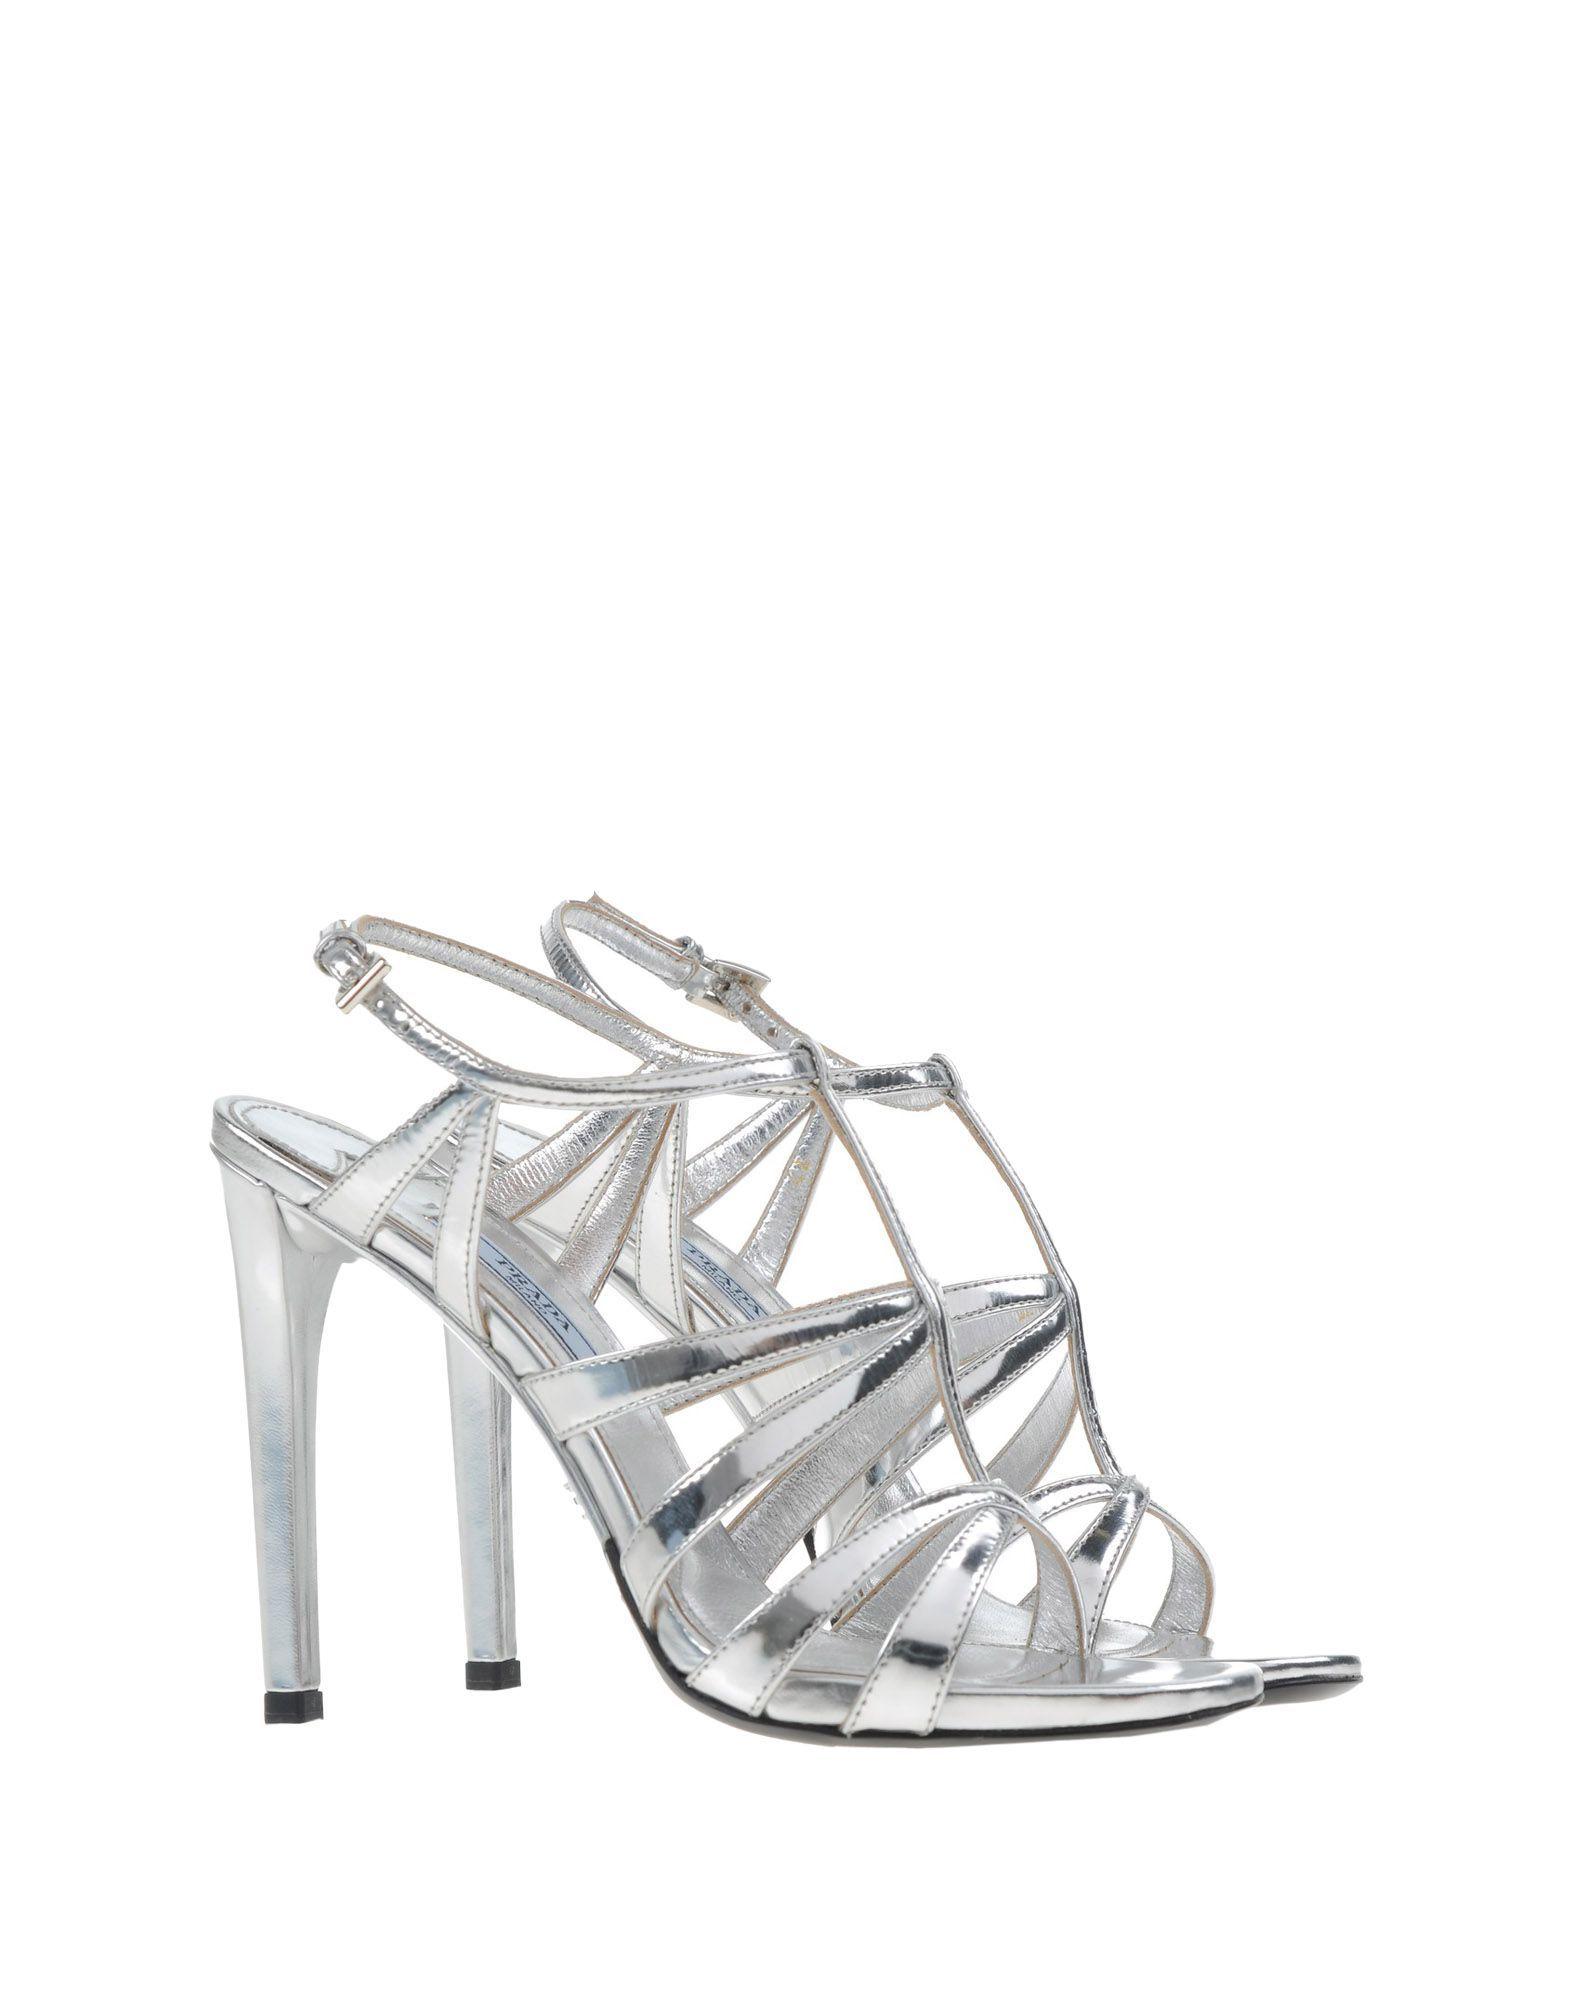 Black sandals ultima online - Prada Sandals Women Prada Sandals Online On Yoox United Kingdom 11069184cw